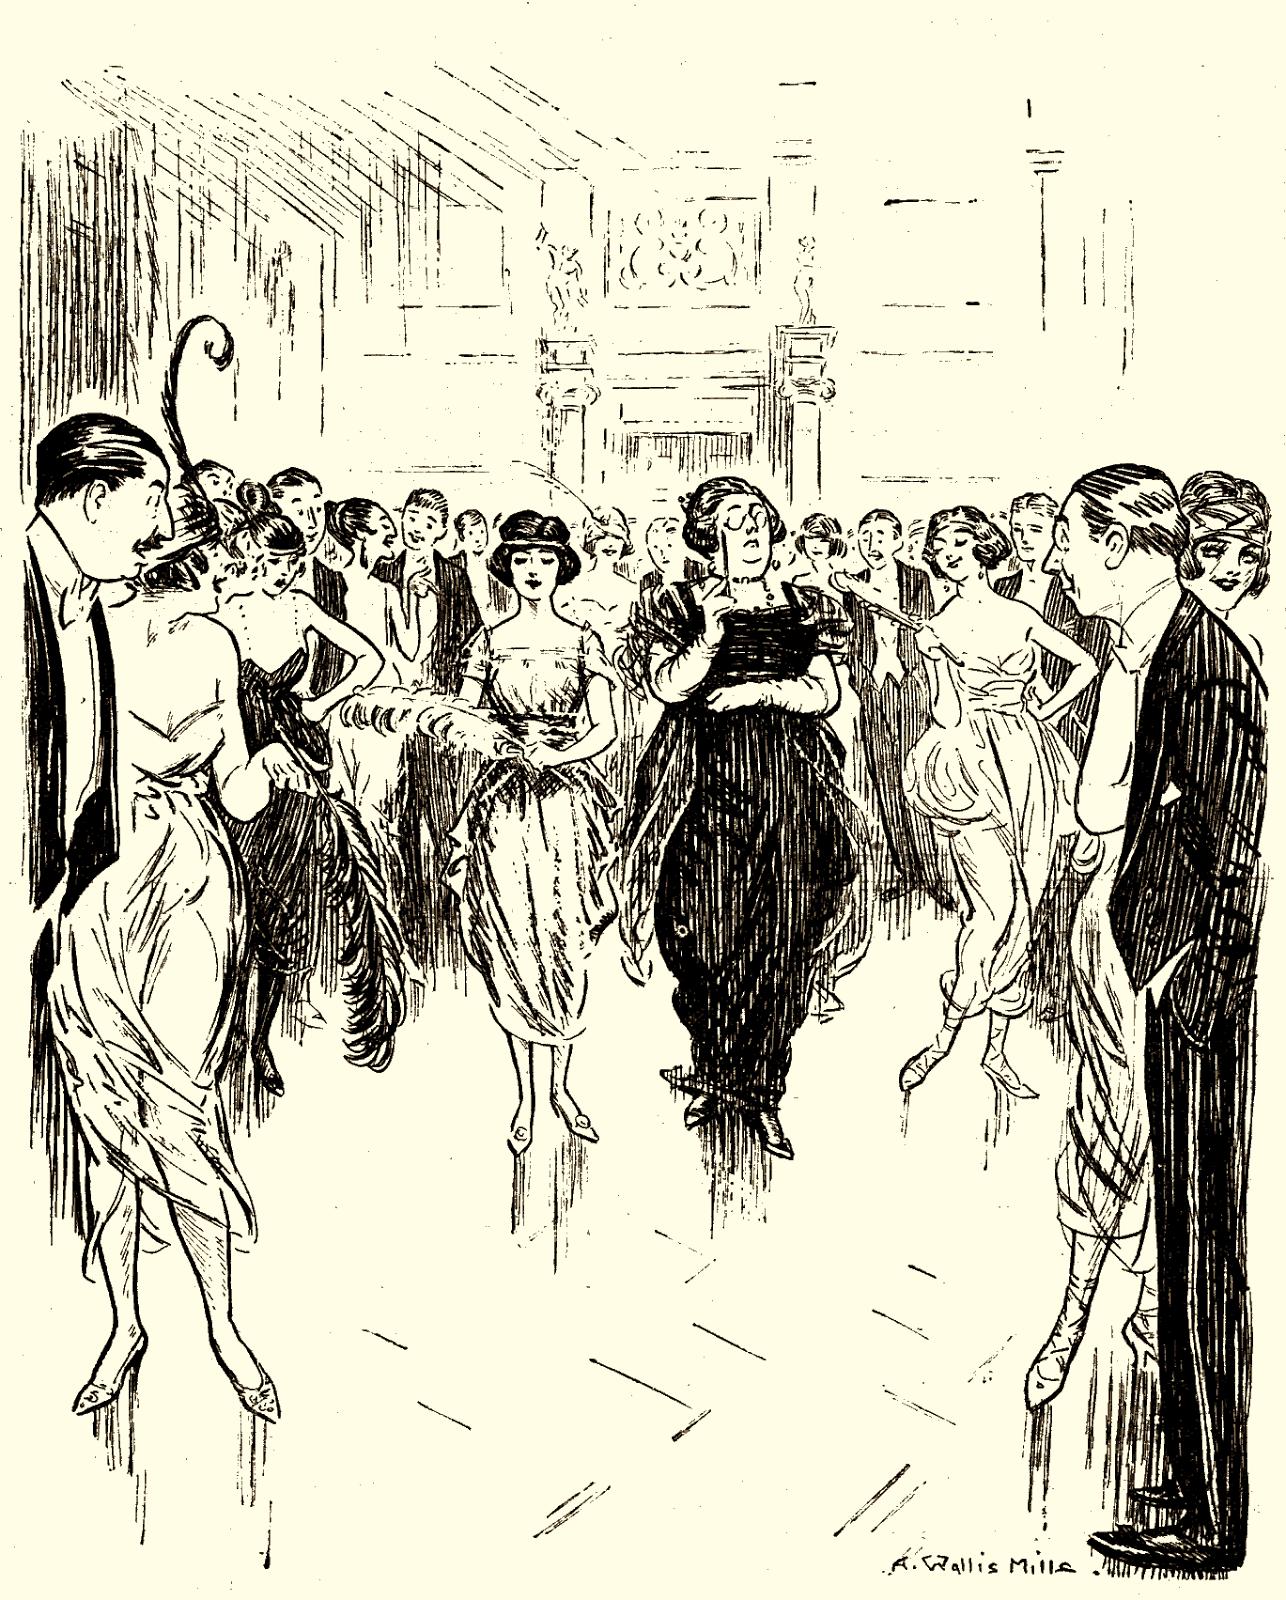 Etiquipedia: Victorian and Edwardian Era Etiquette for ... | 1286 x 1600 png 1512kB